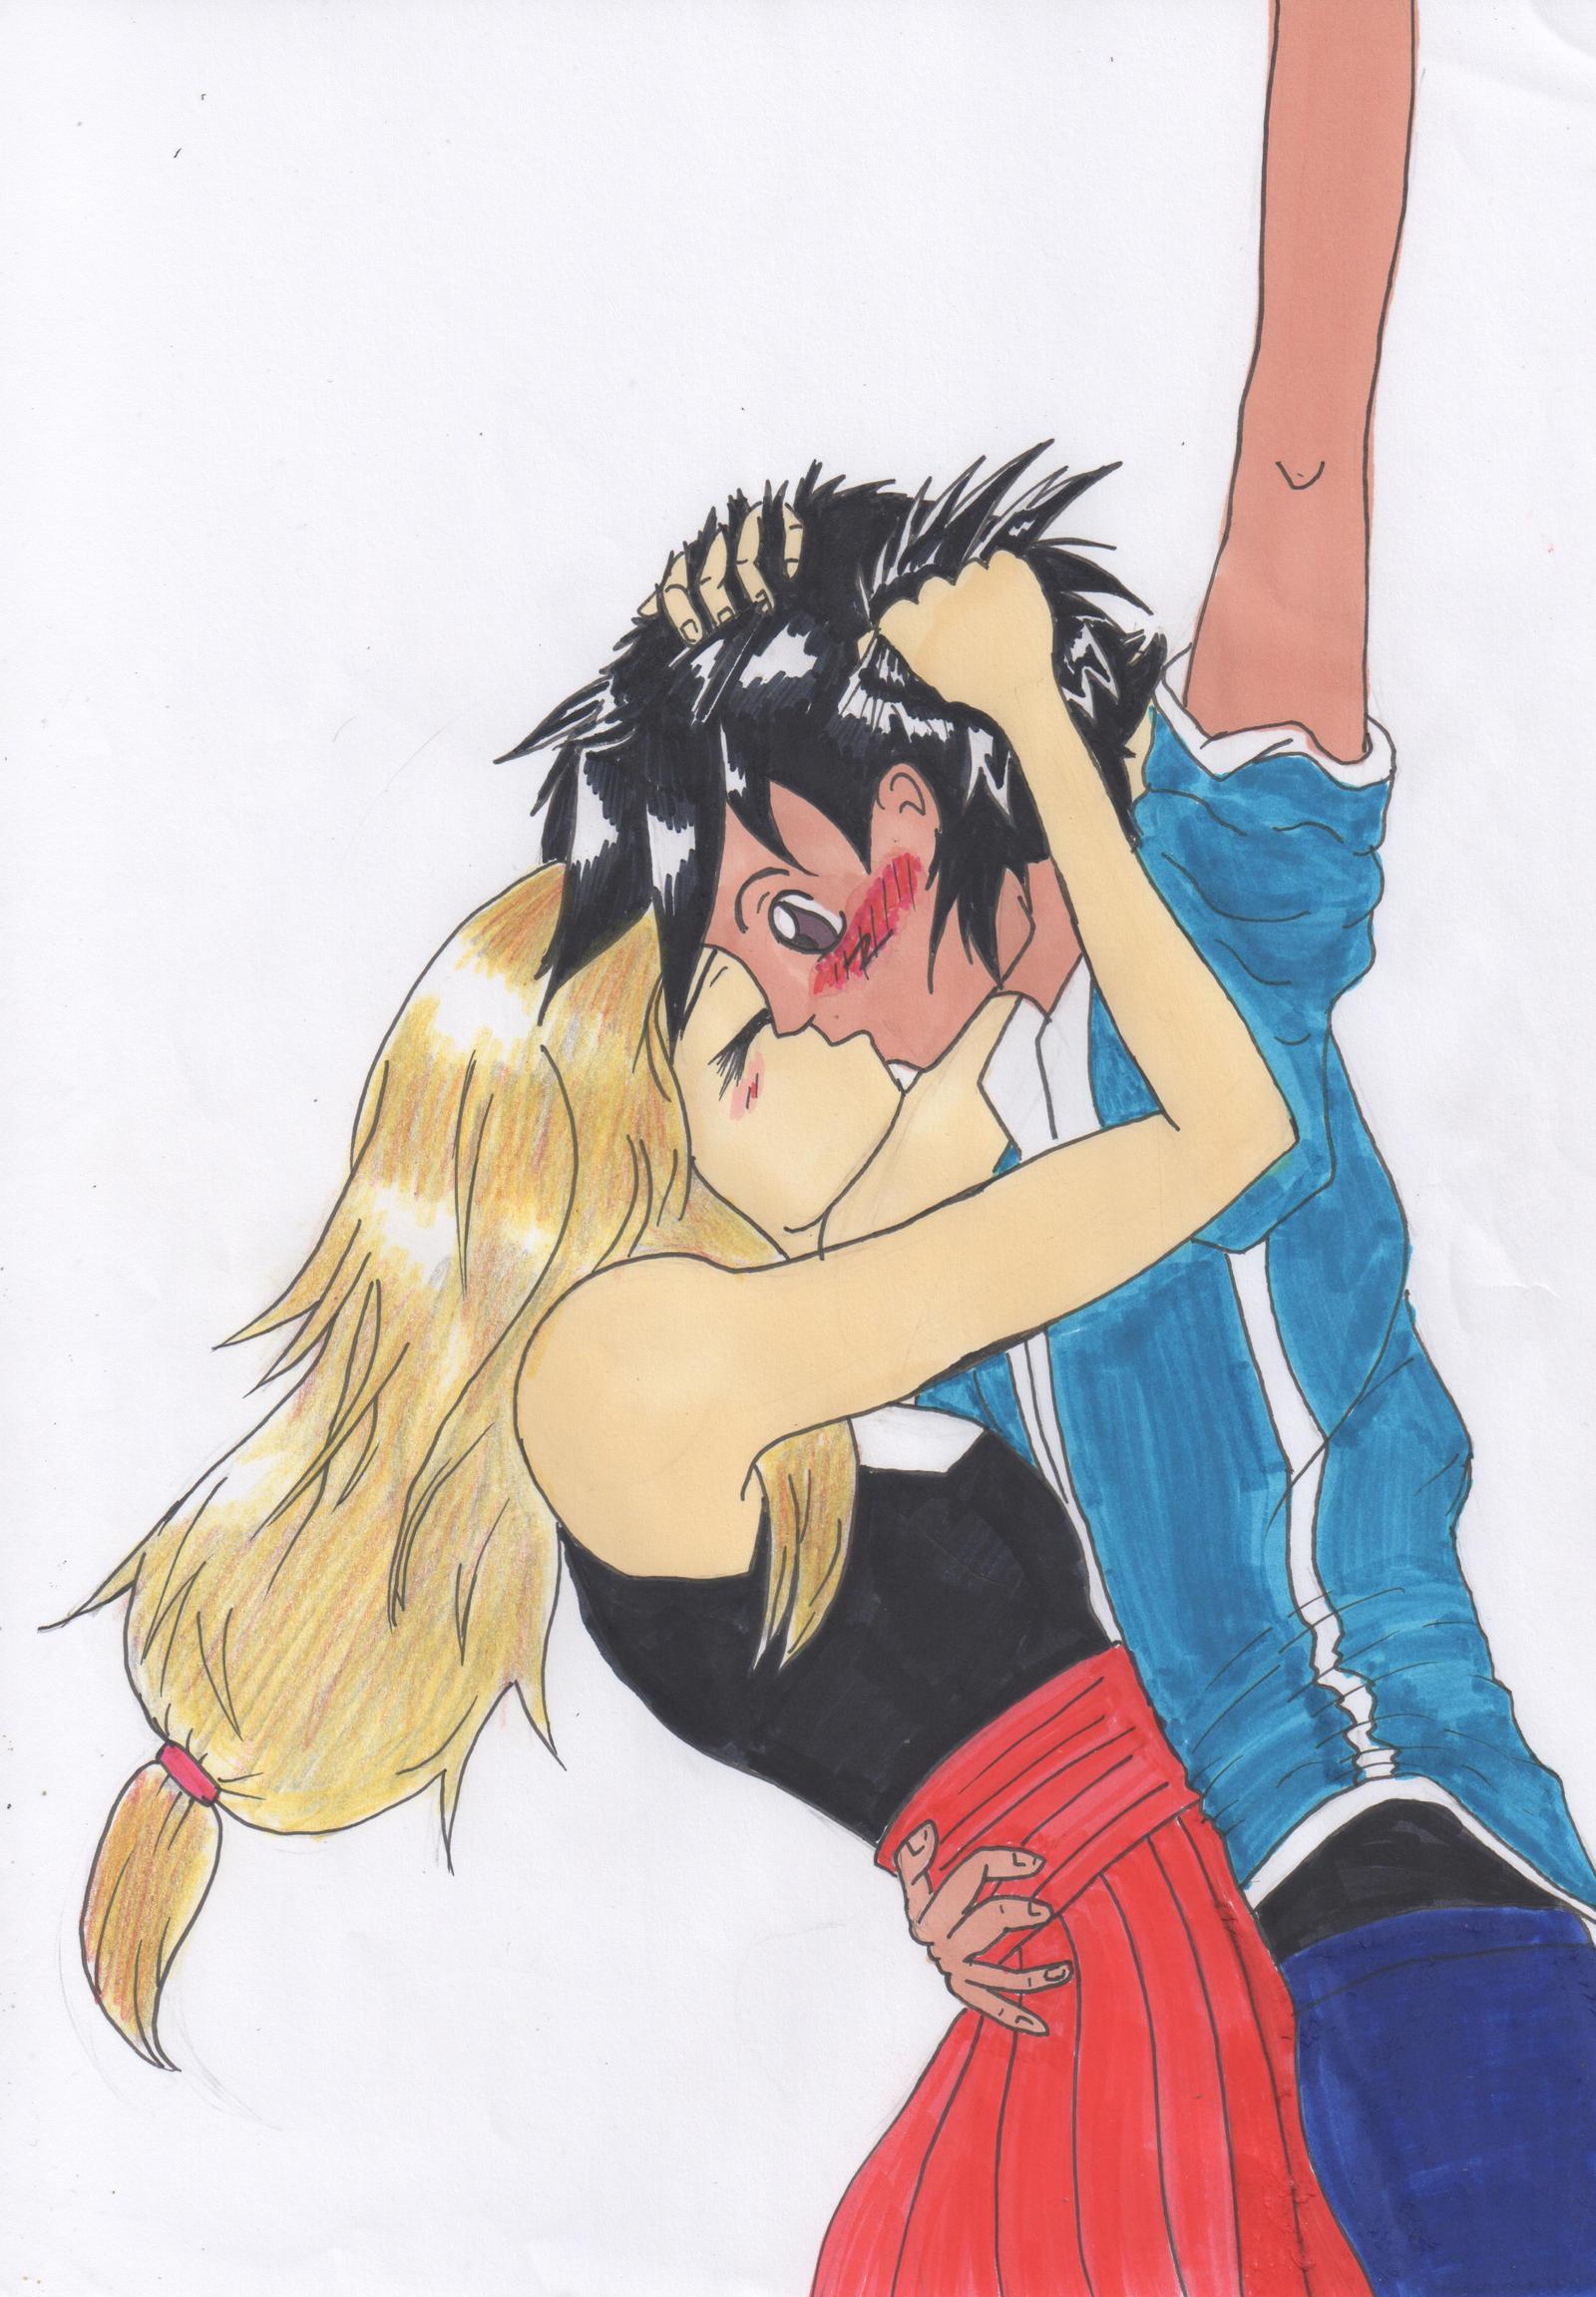 Ash/Satoshi x serena by Louise008